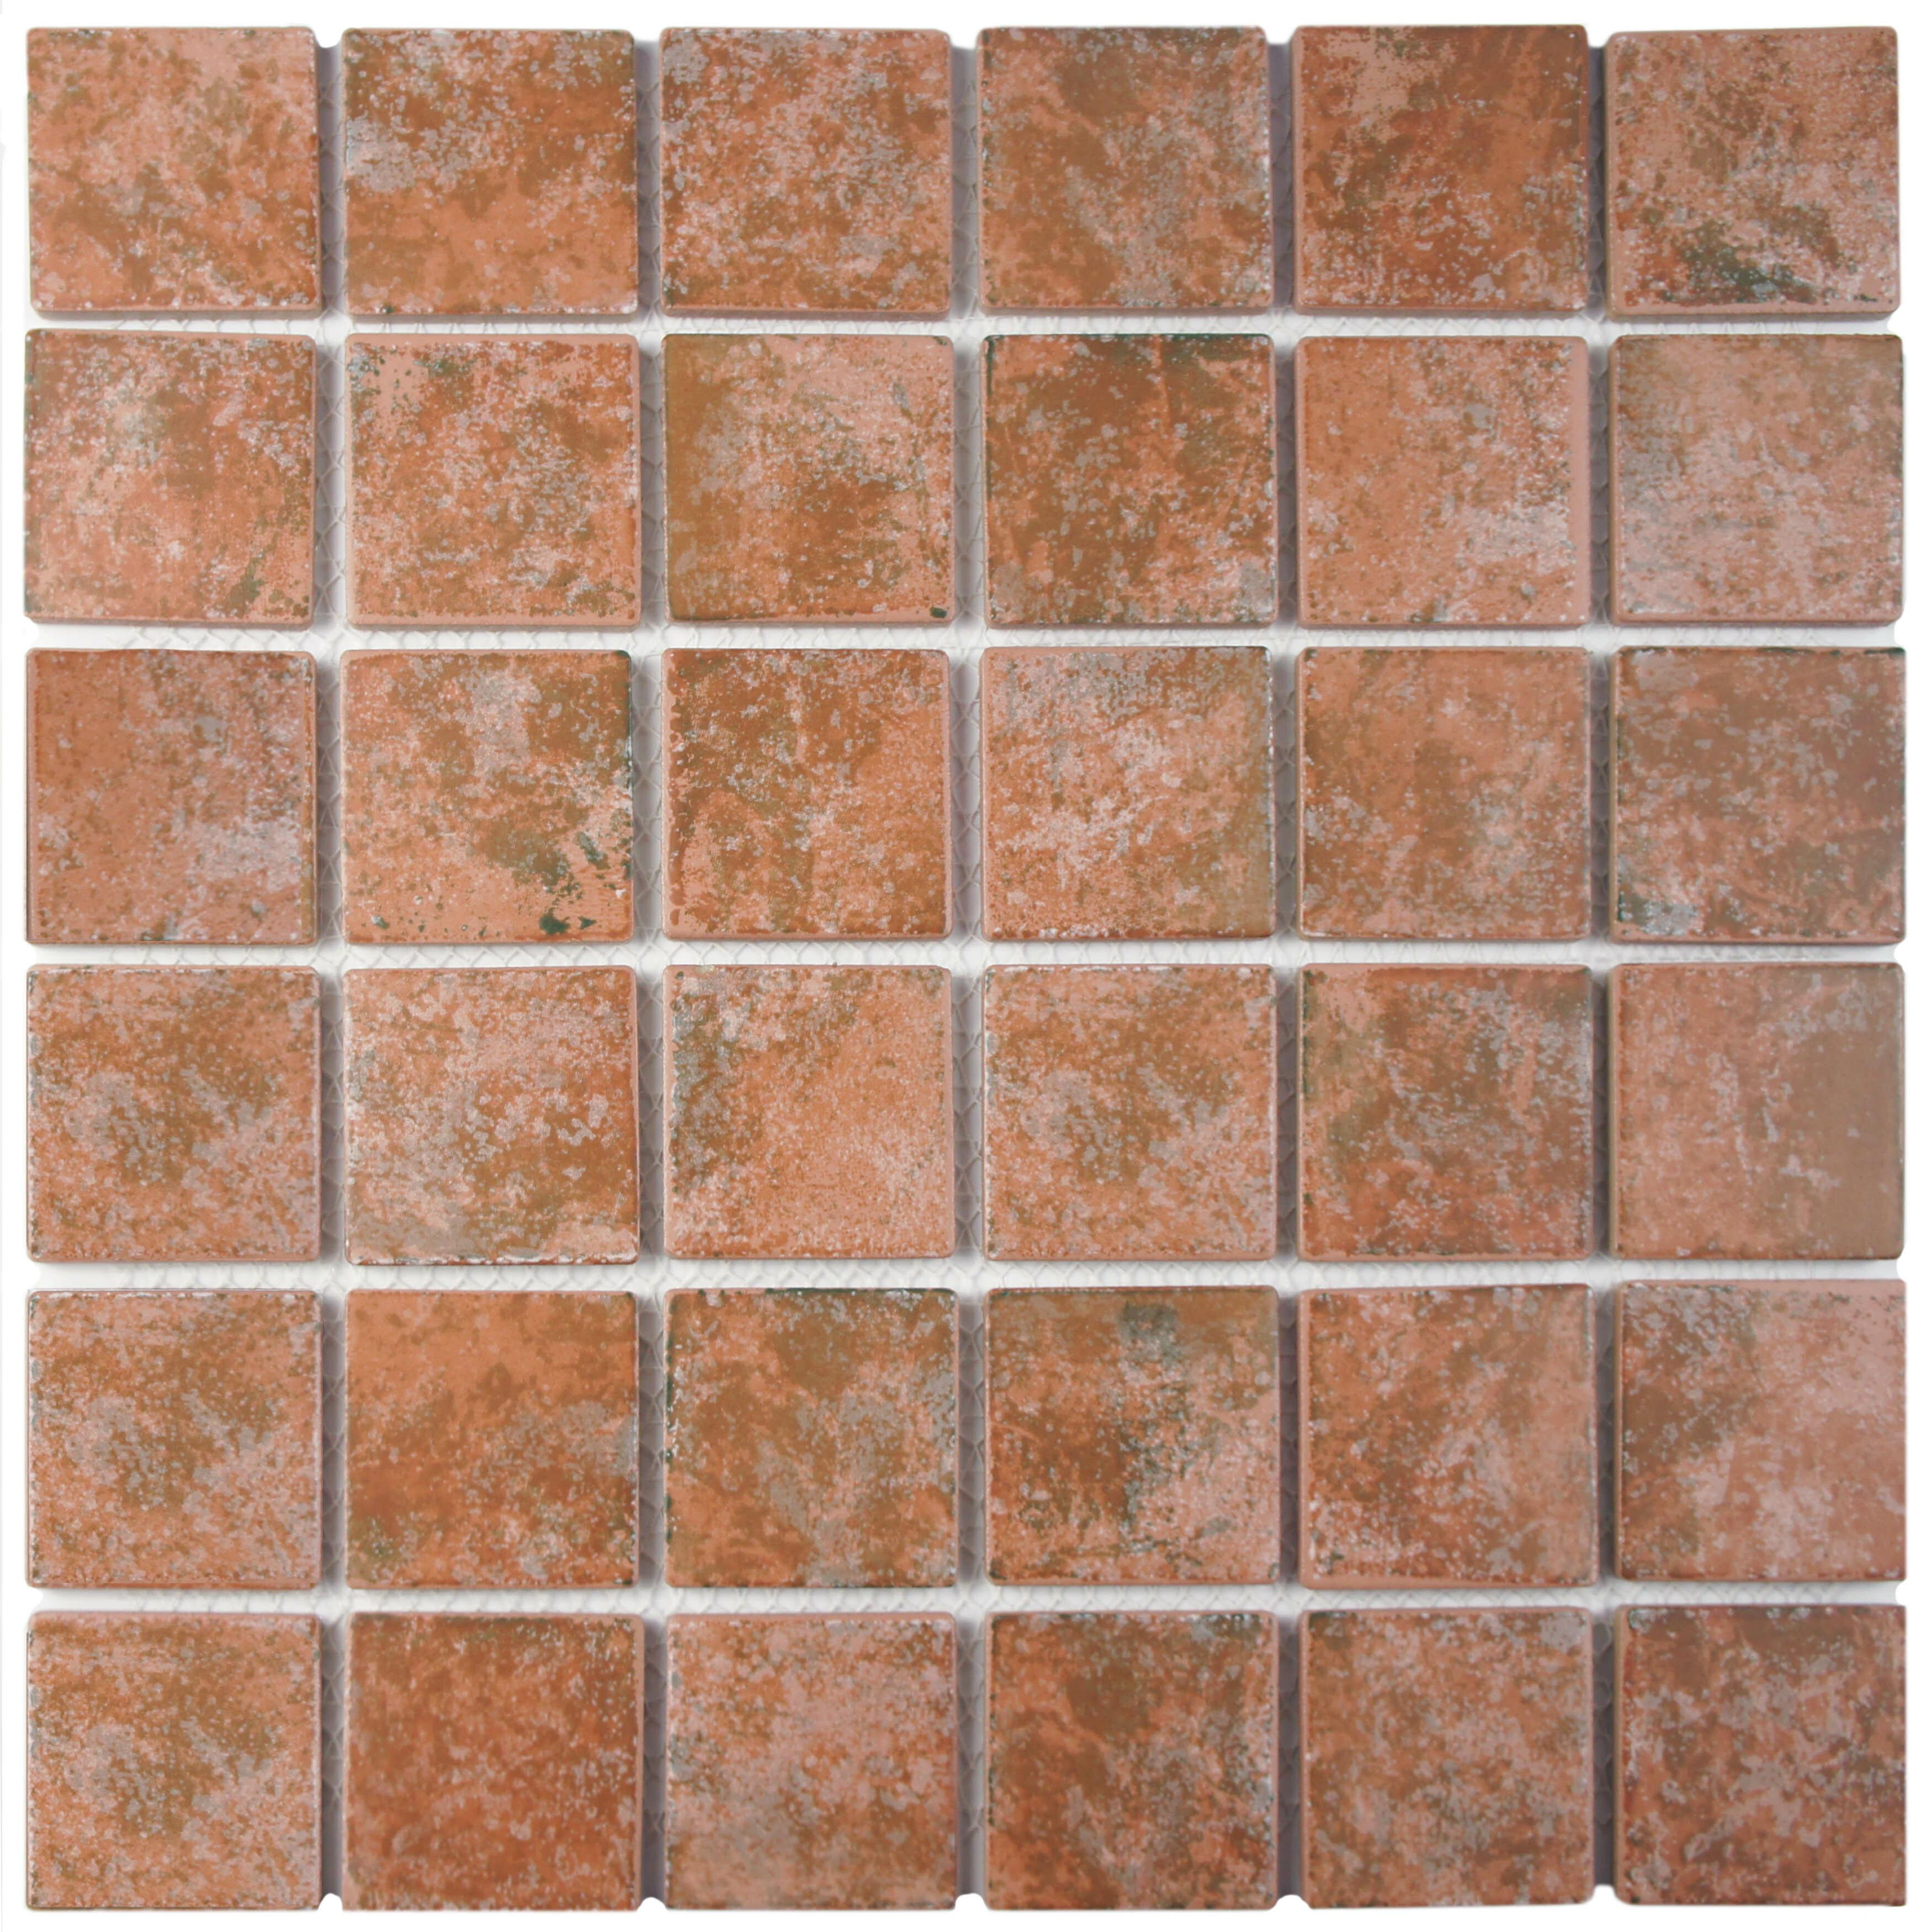 Elitetile Elbert 2 X Porcelain Mosaic Tile In Matte Brown Orange Gray Wayfair